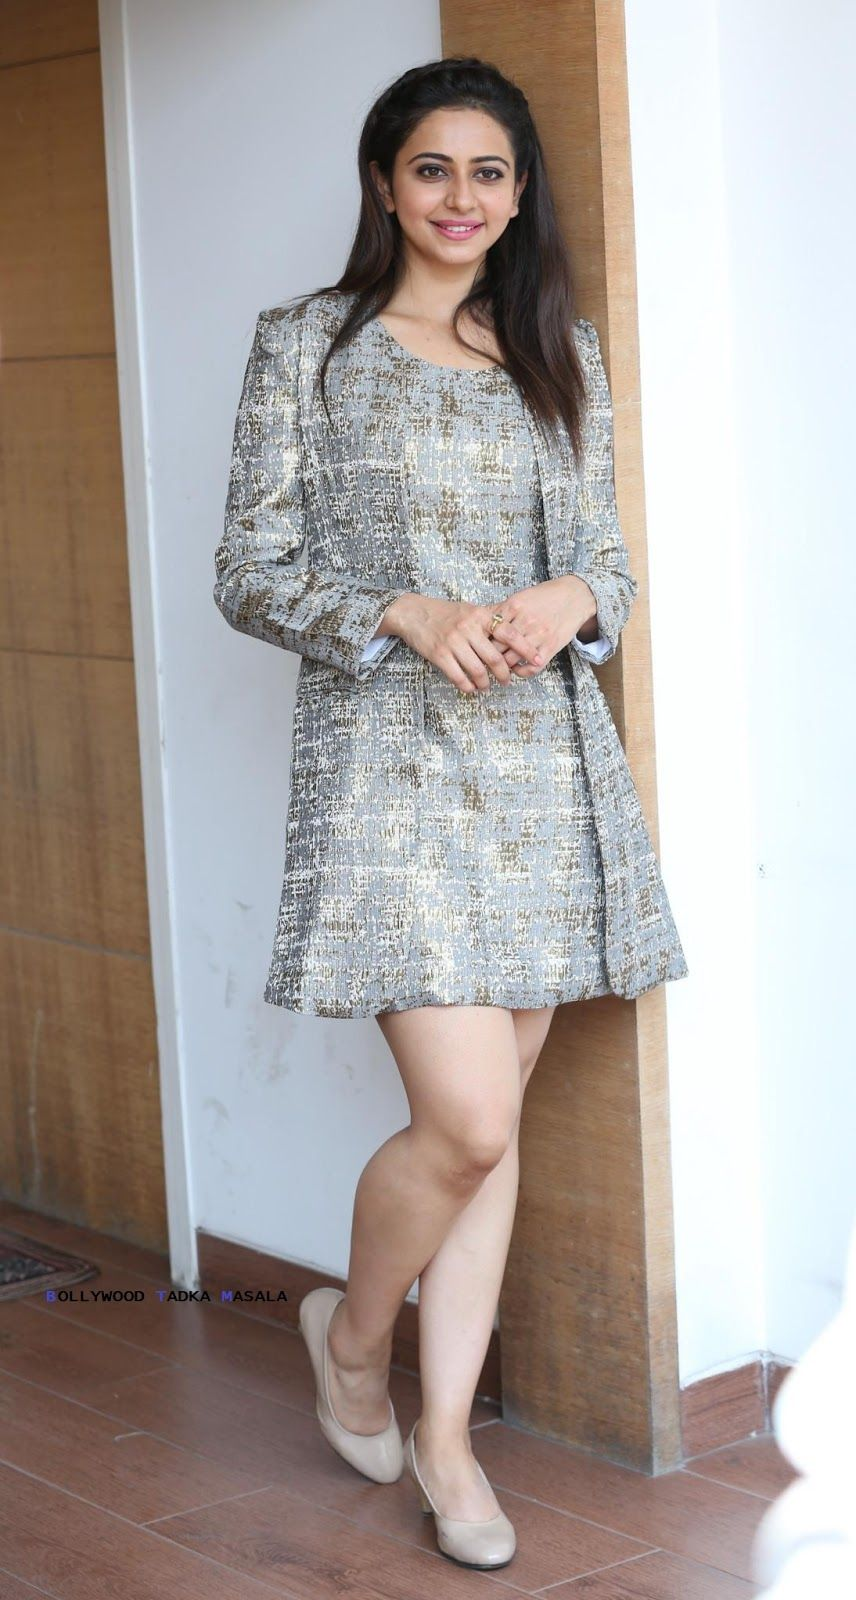 White apron gurgaon - Buy Latest Designer Suits For Ladies Online In Delhi Ncr Gurgaon Designer Anarkali